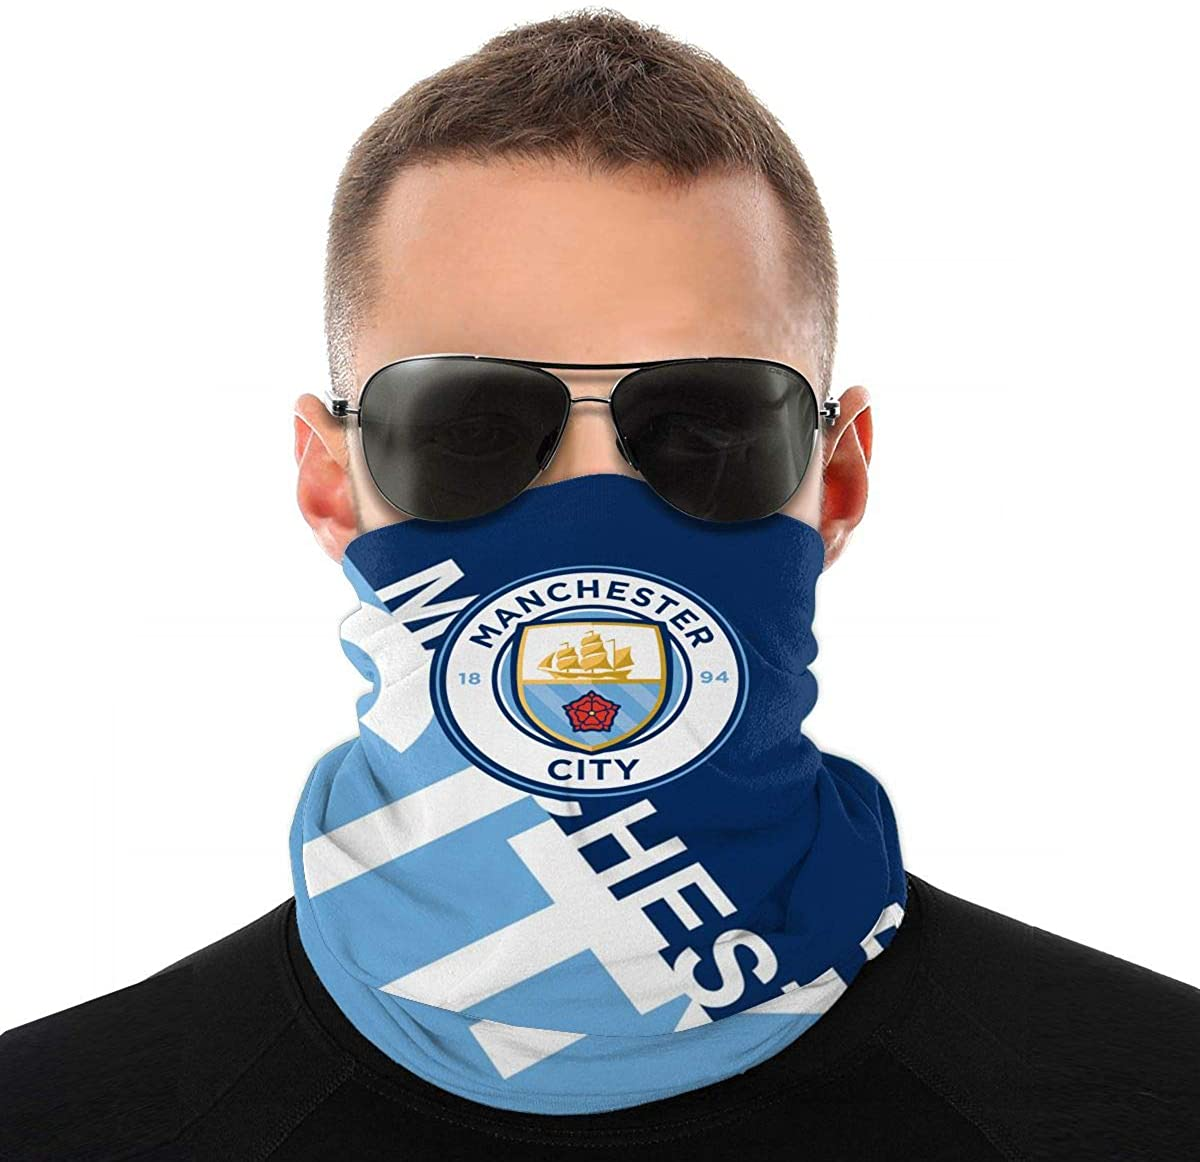 Football Club Face Cover Scarf Bandana, Soccer Neck Gaiter Mask Headwear for Men Women Sport Outdoor